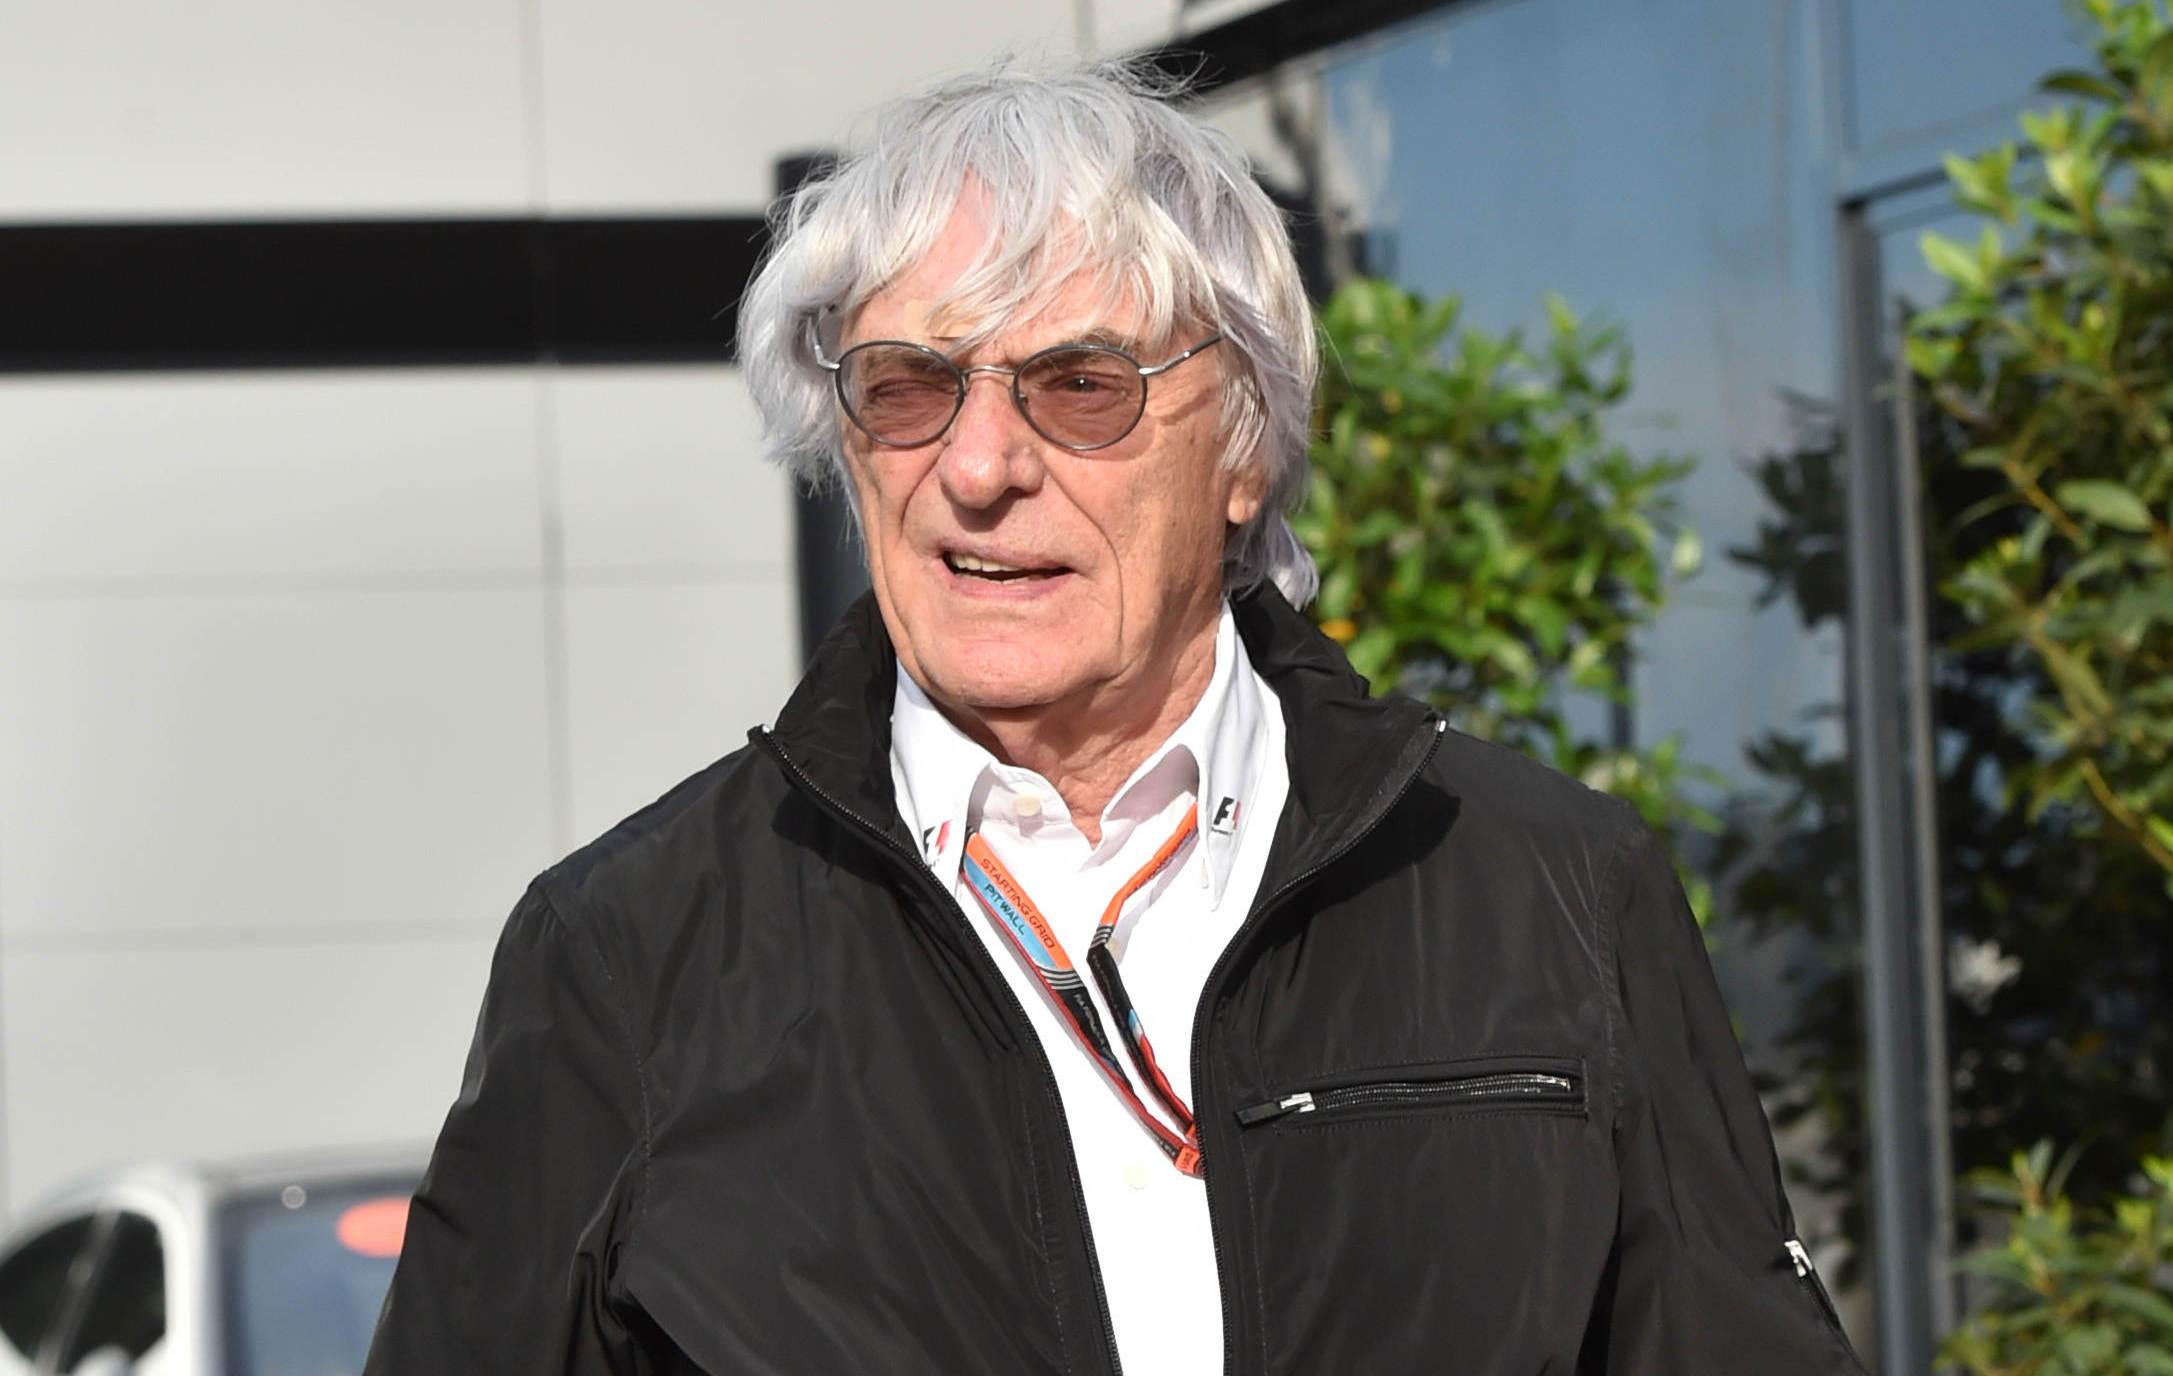 F1 - Quand Ecclestone met le feu au paddock?